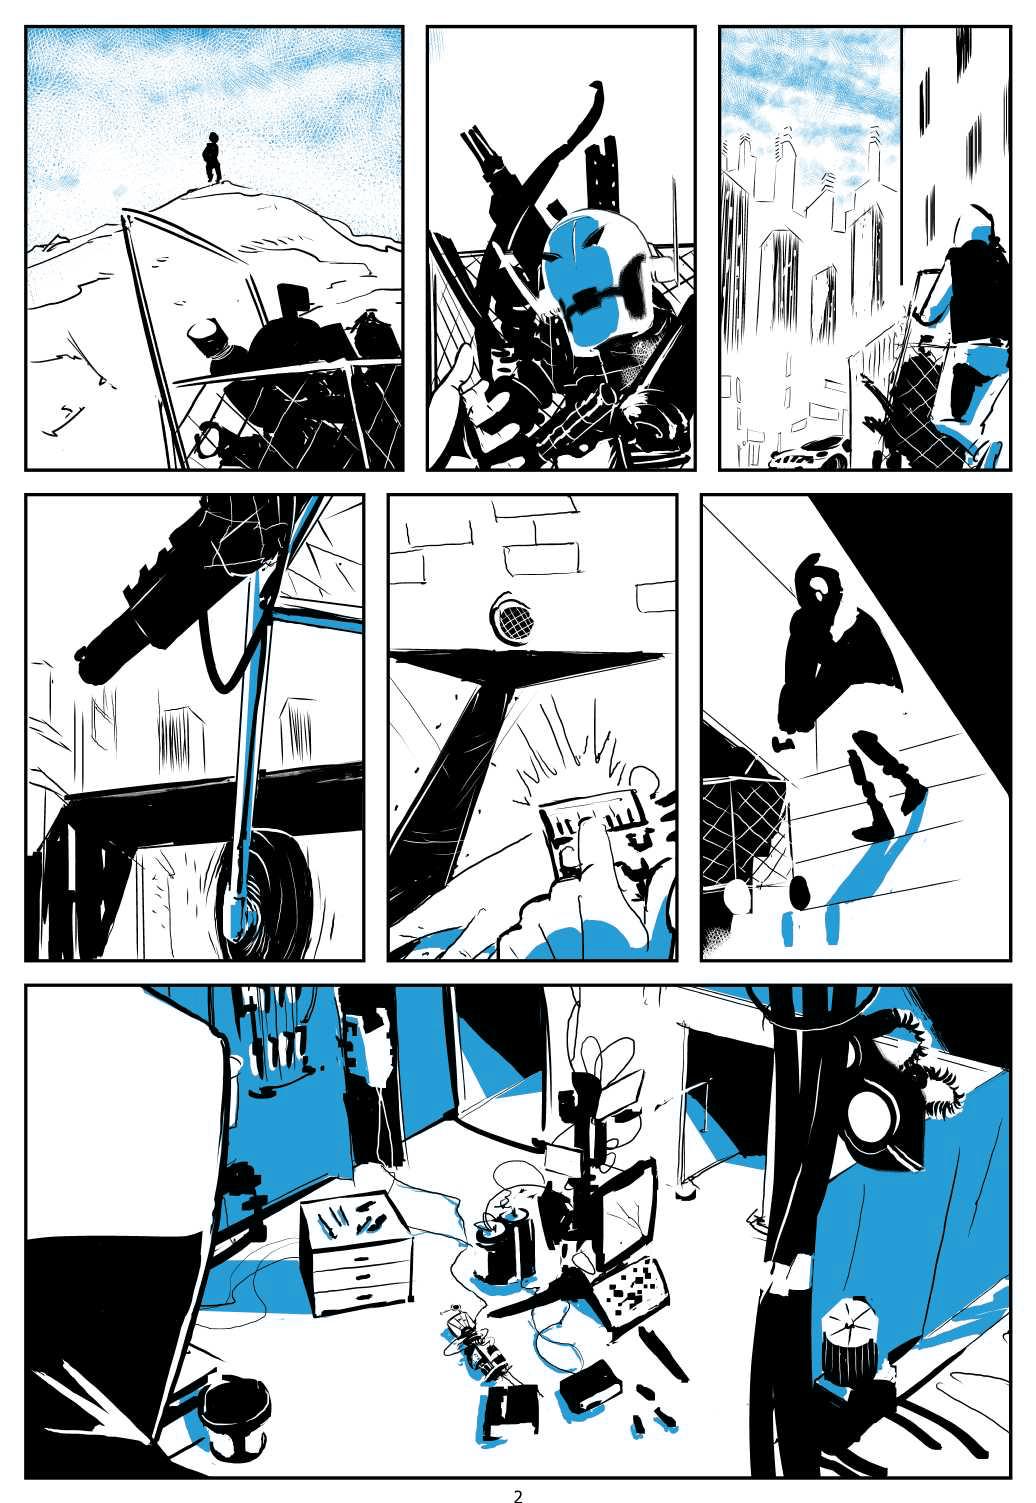 comics comic books Avengers spot color sci-fi super heroes